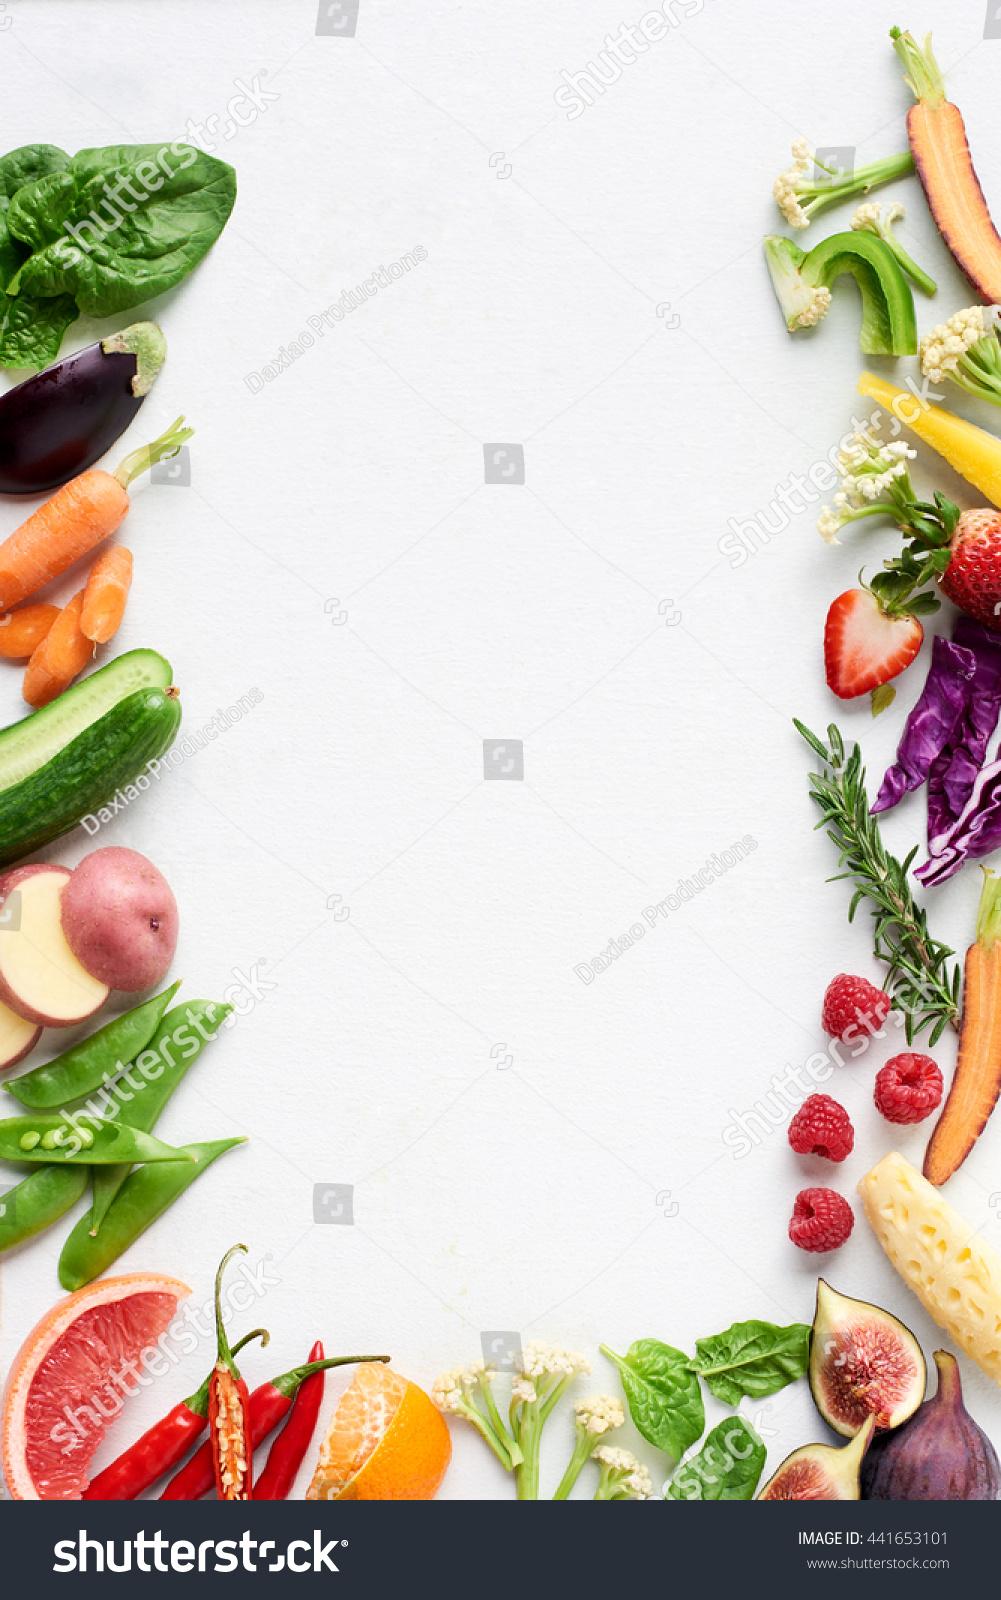 Food Background Border Flat Lay Rainbow Stock Photo ...